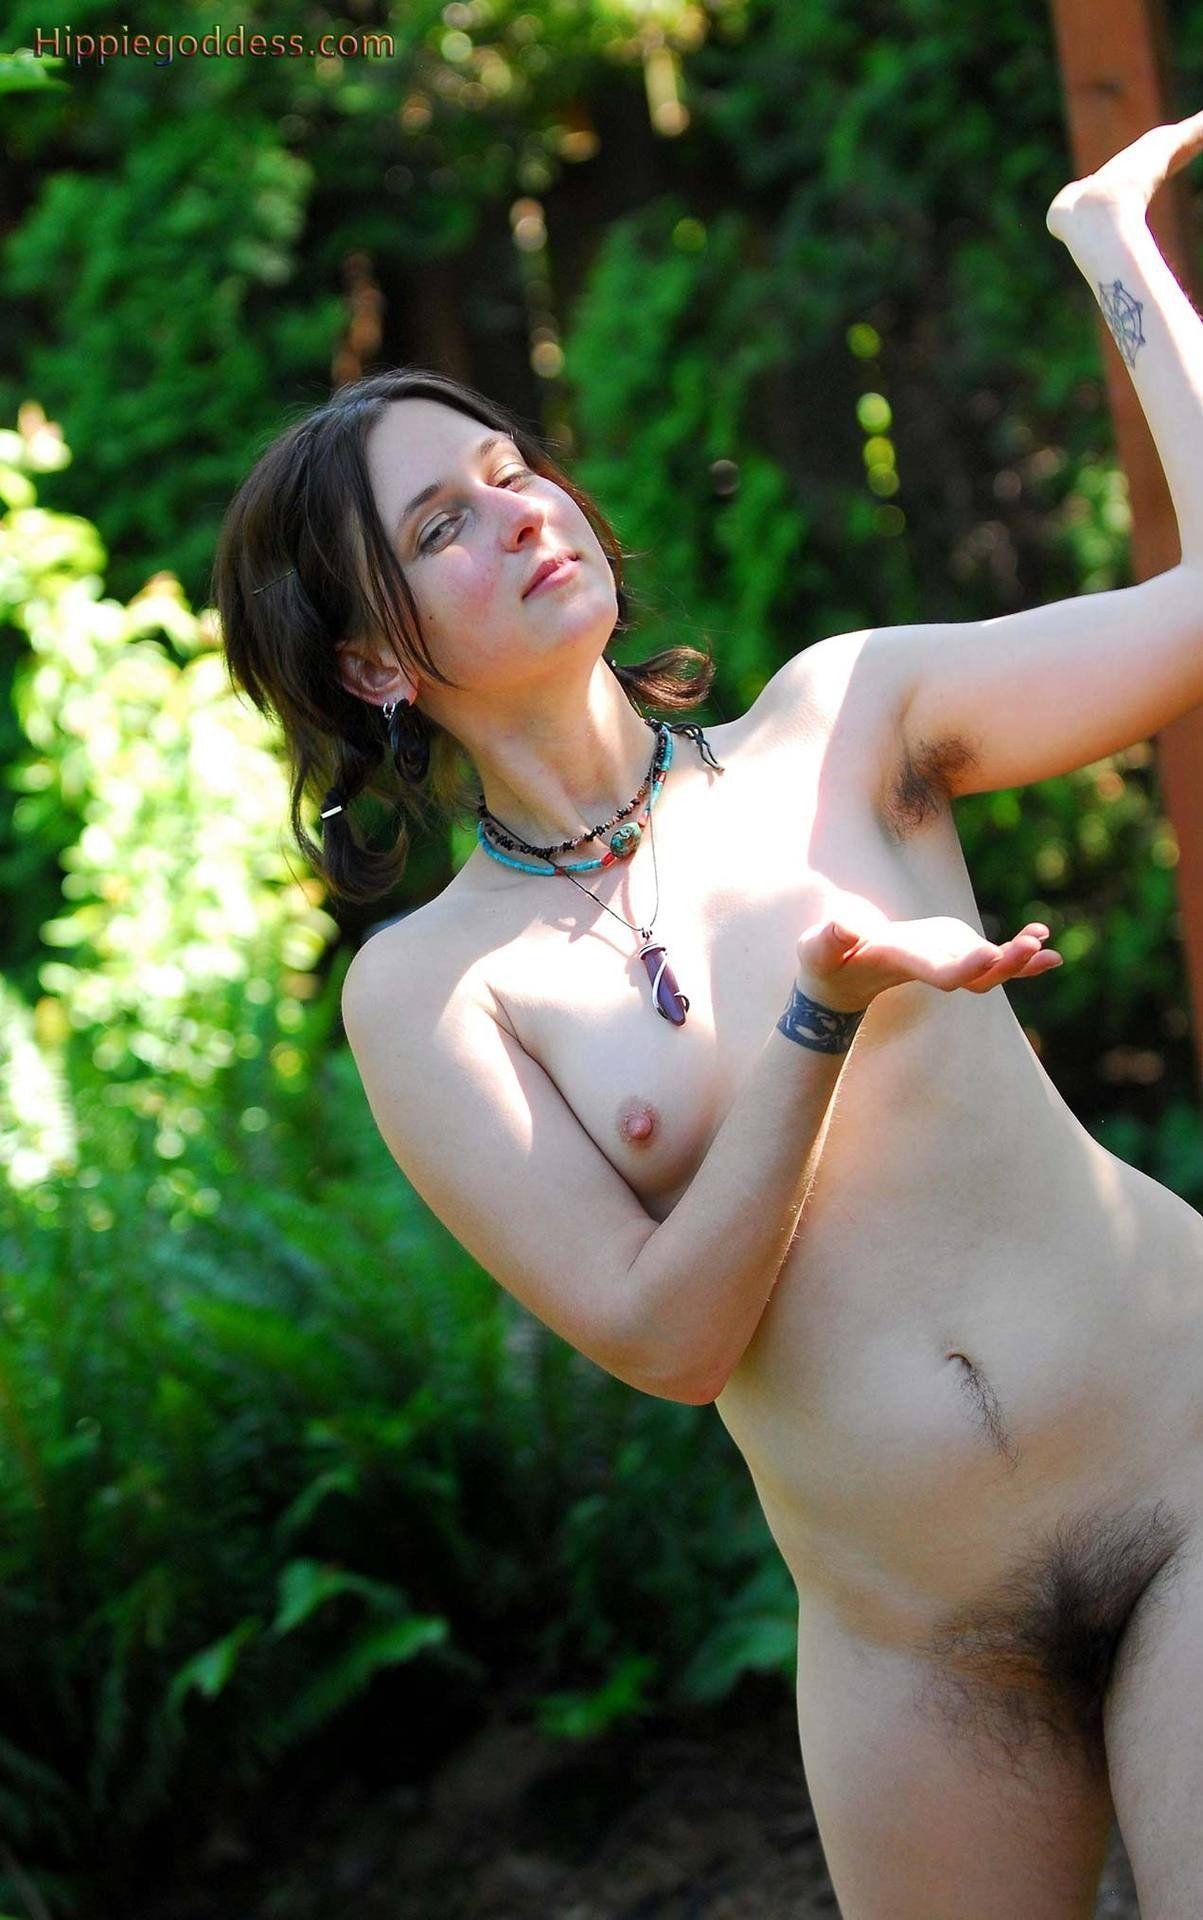 Free amature erotic photos